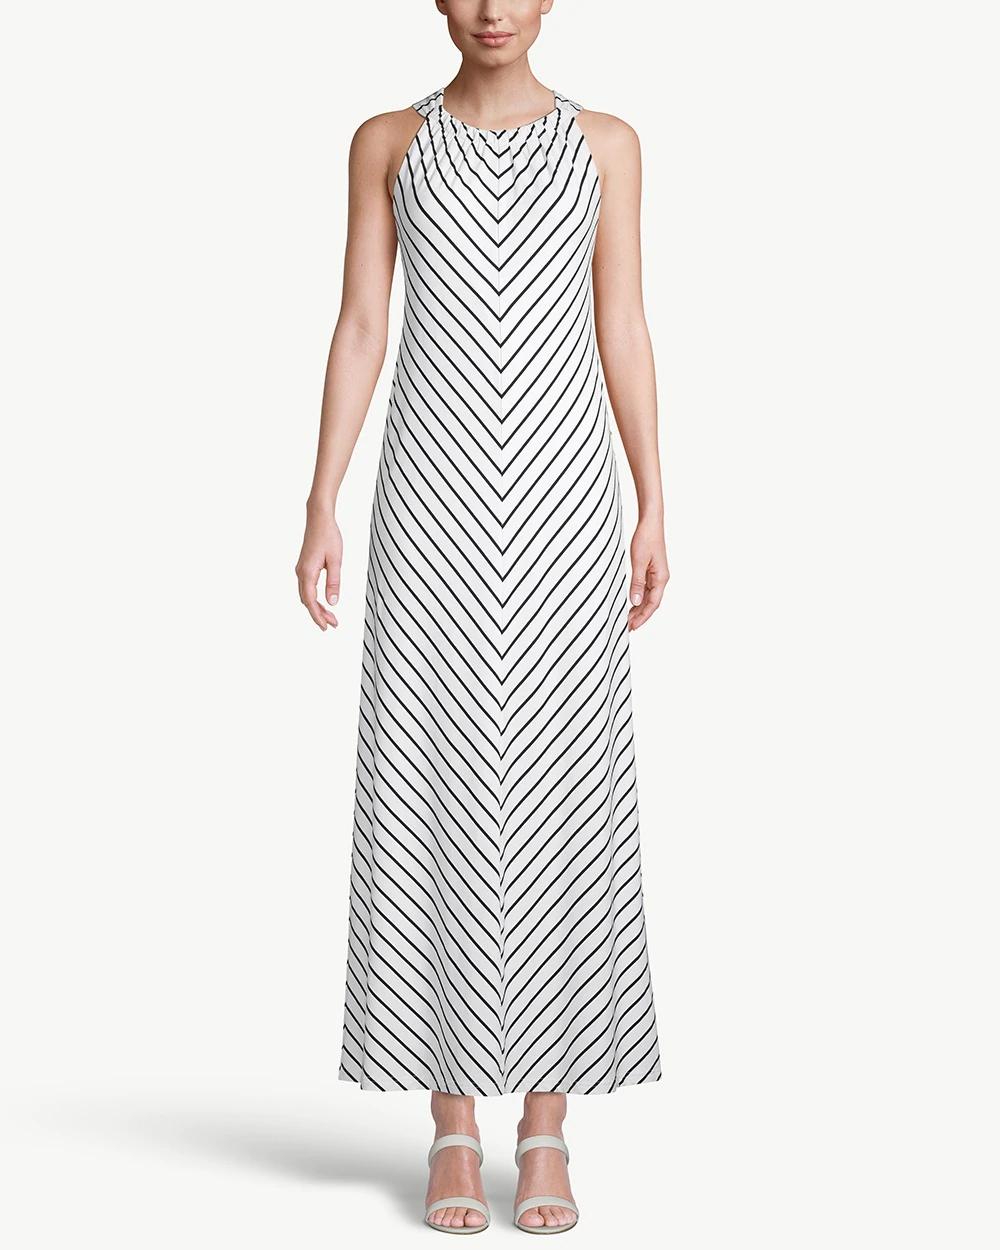 Chico S Sleeveless Halter Neck Striped Maxi Dress Striped Maxi Dresses Petite Maxi Dress Petite Maxi Dress Casual [ 1250 x 1000 Pixel ]